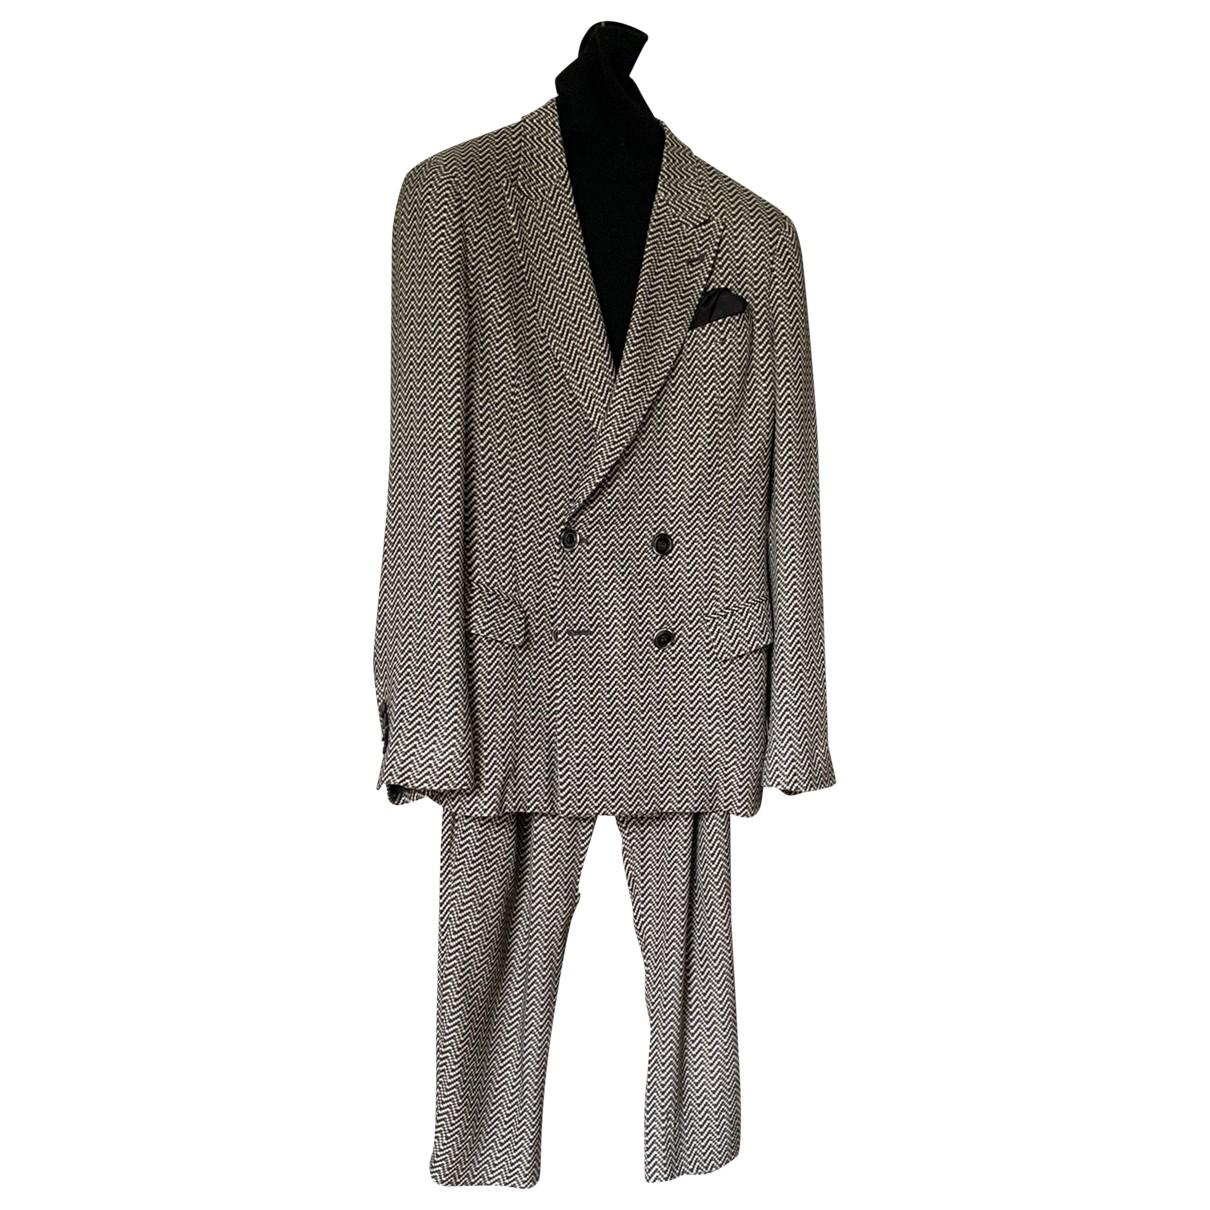 Giorgio Armani N Black Suits for Men M International